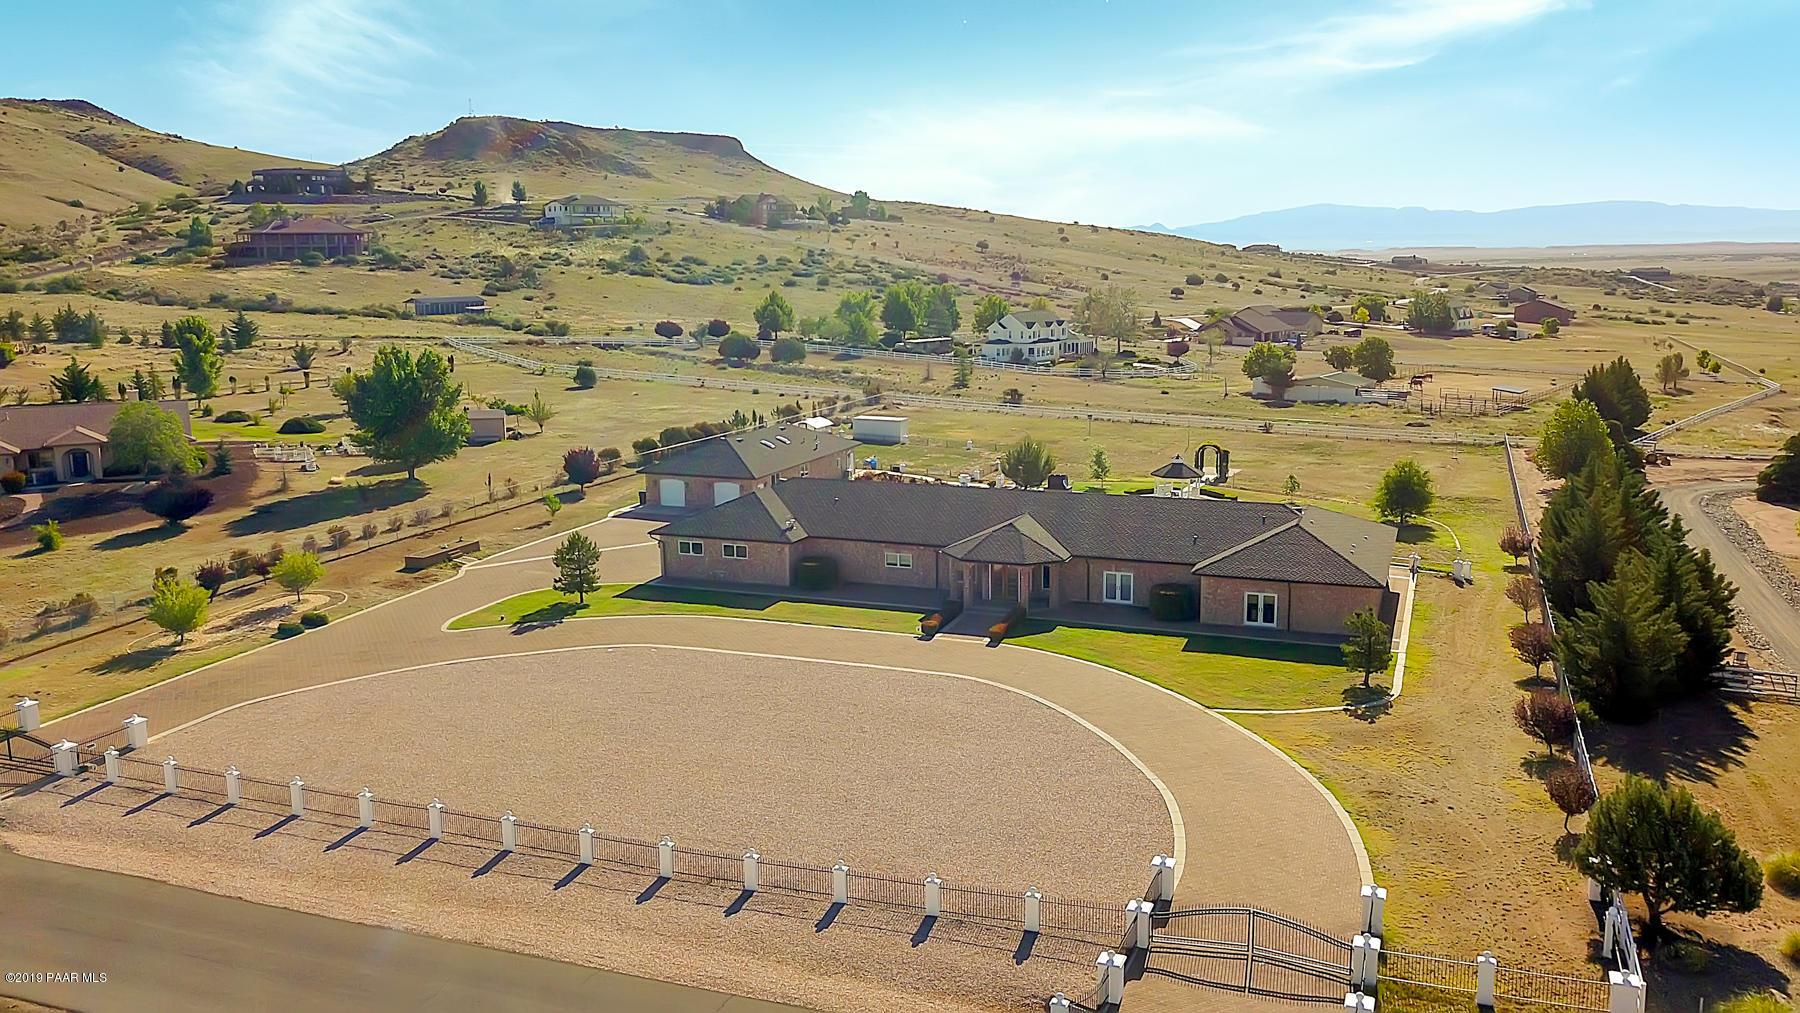 Photo of 11375 Williamson Valley Ranch, Prescott, AZ 86305